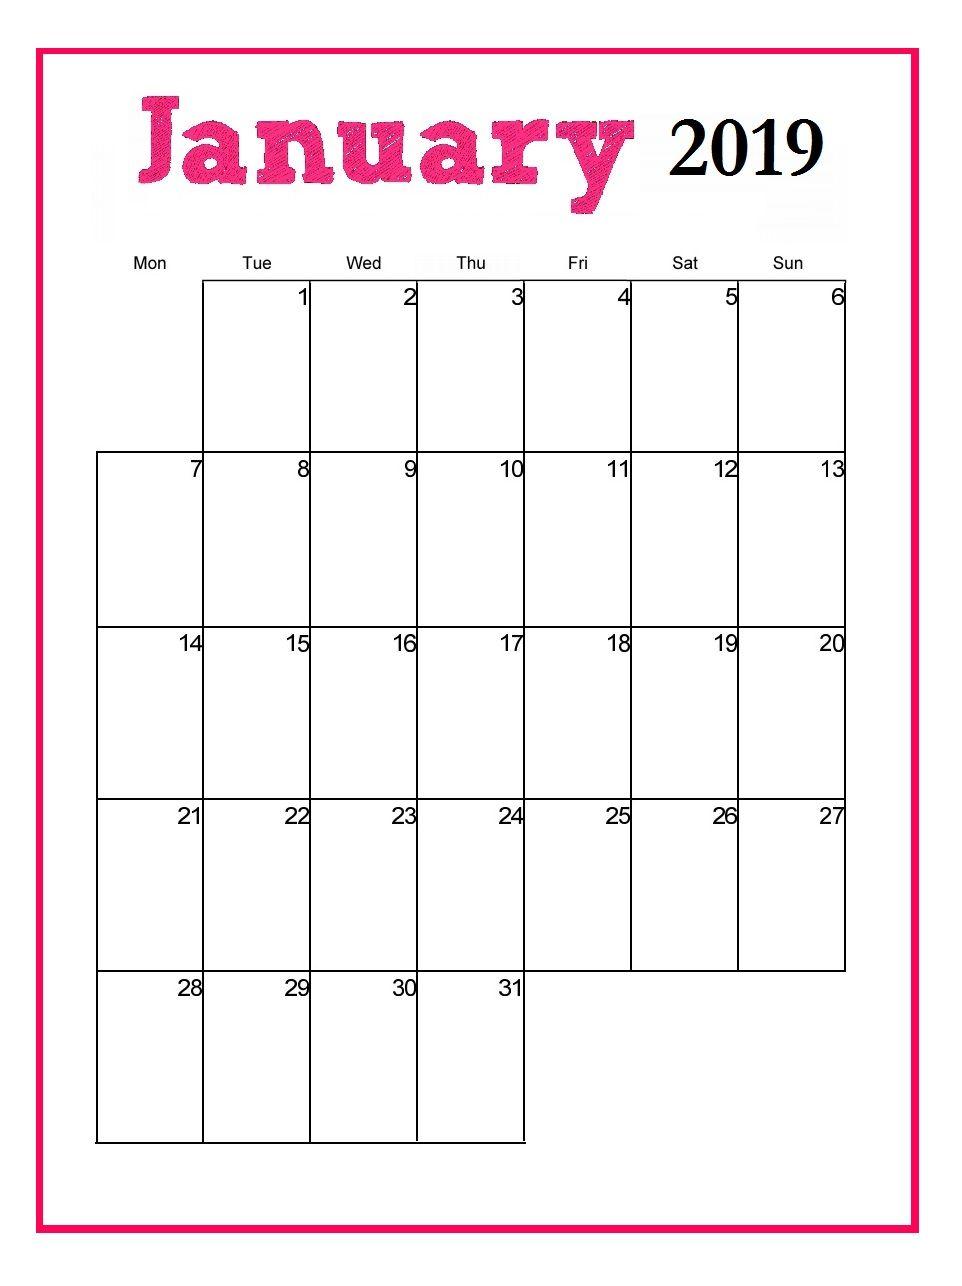 January 2019 Calendar Vertical Printable January 2019 Vertical Calendar   MaxCalendars   Monthly